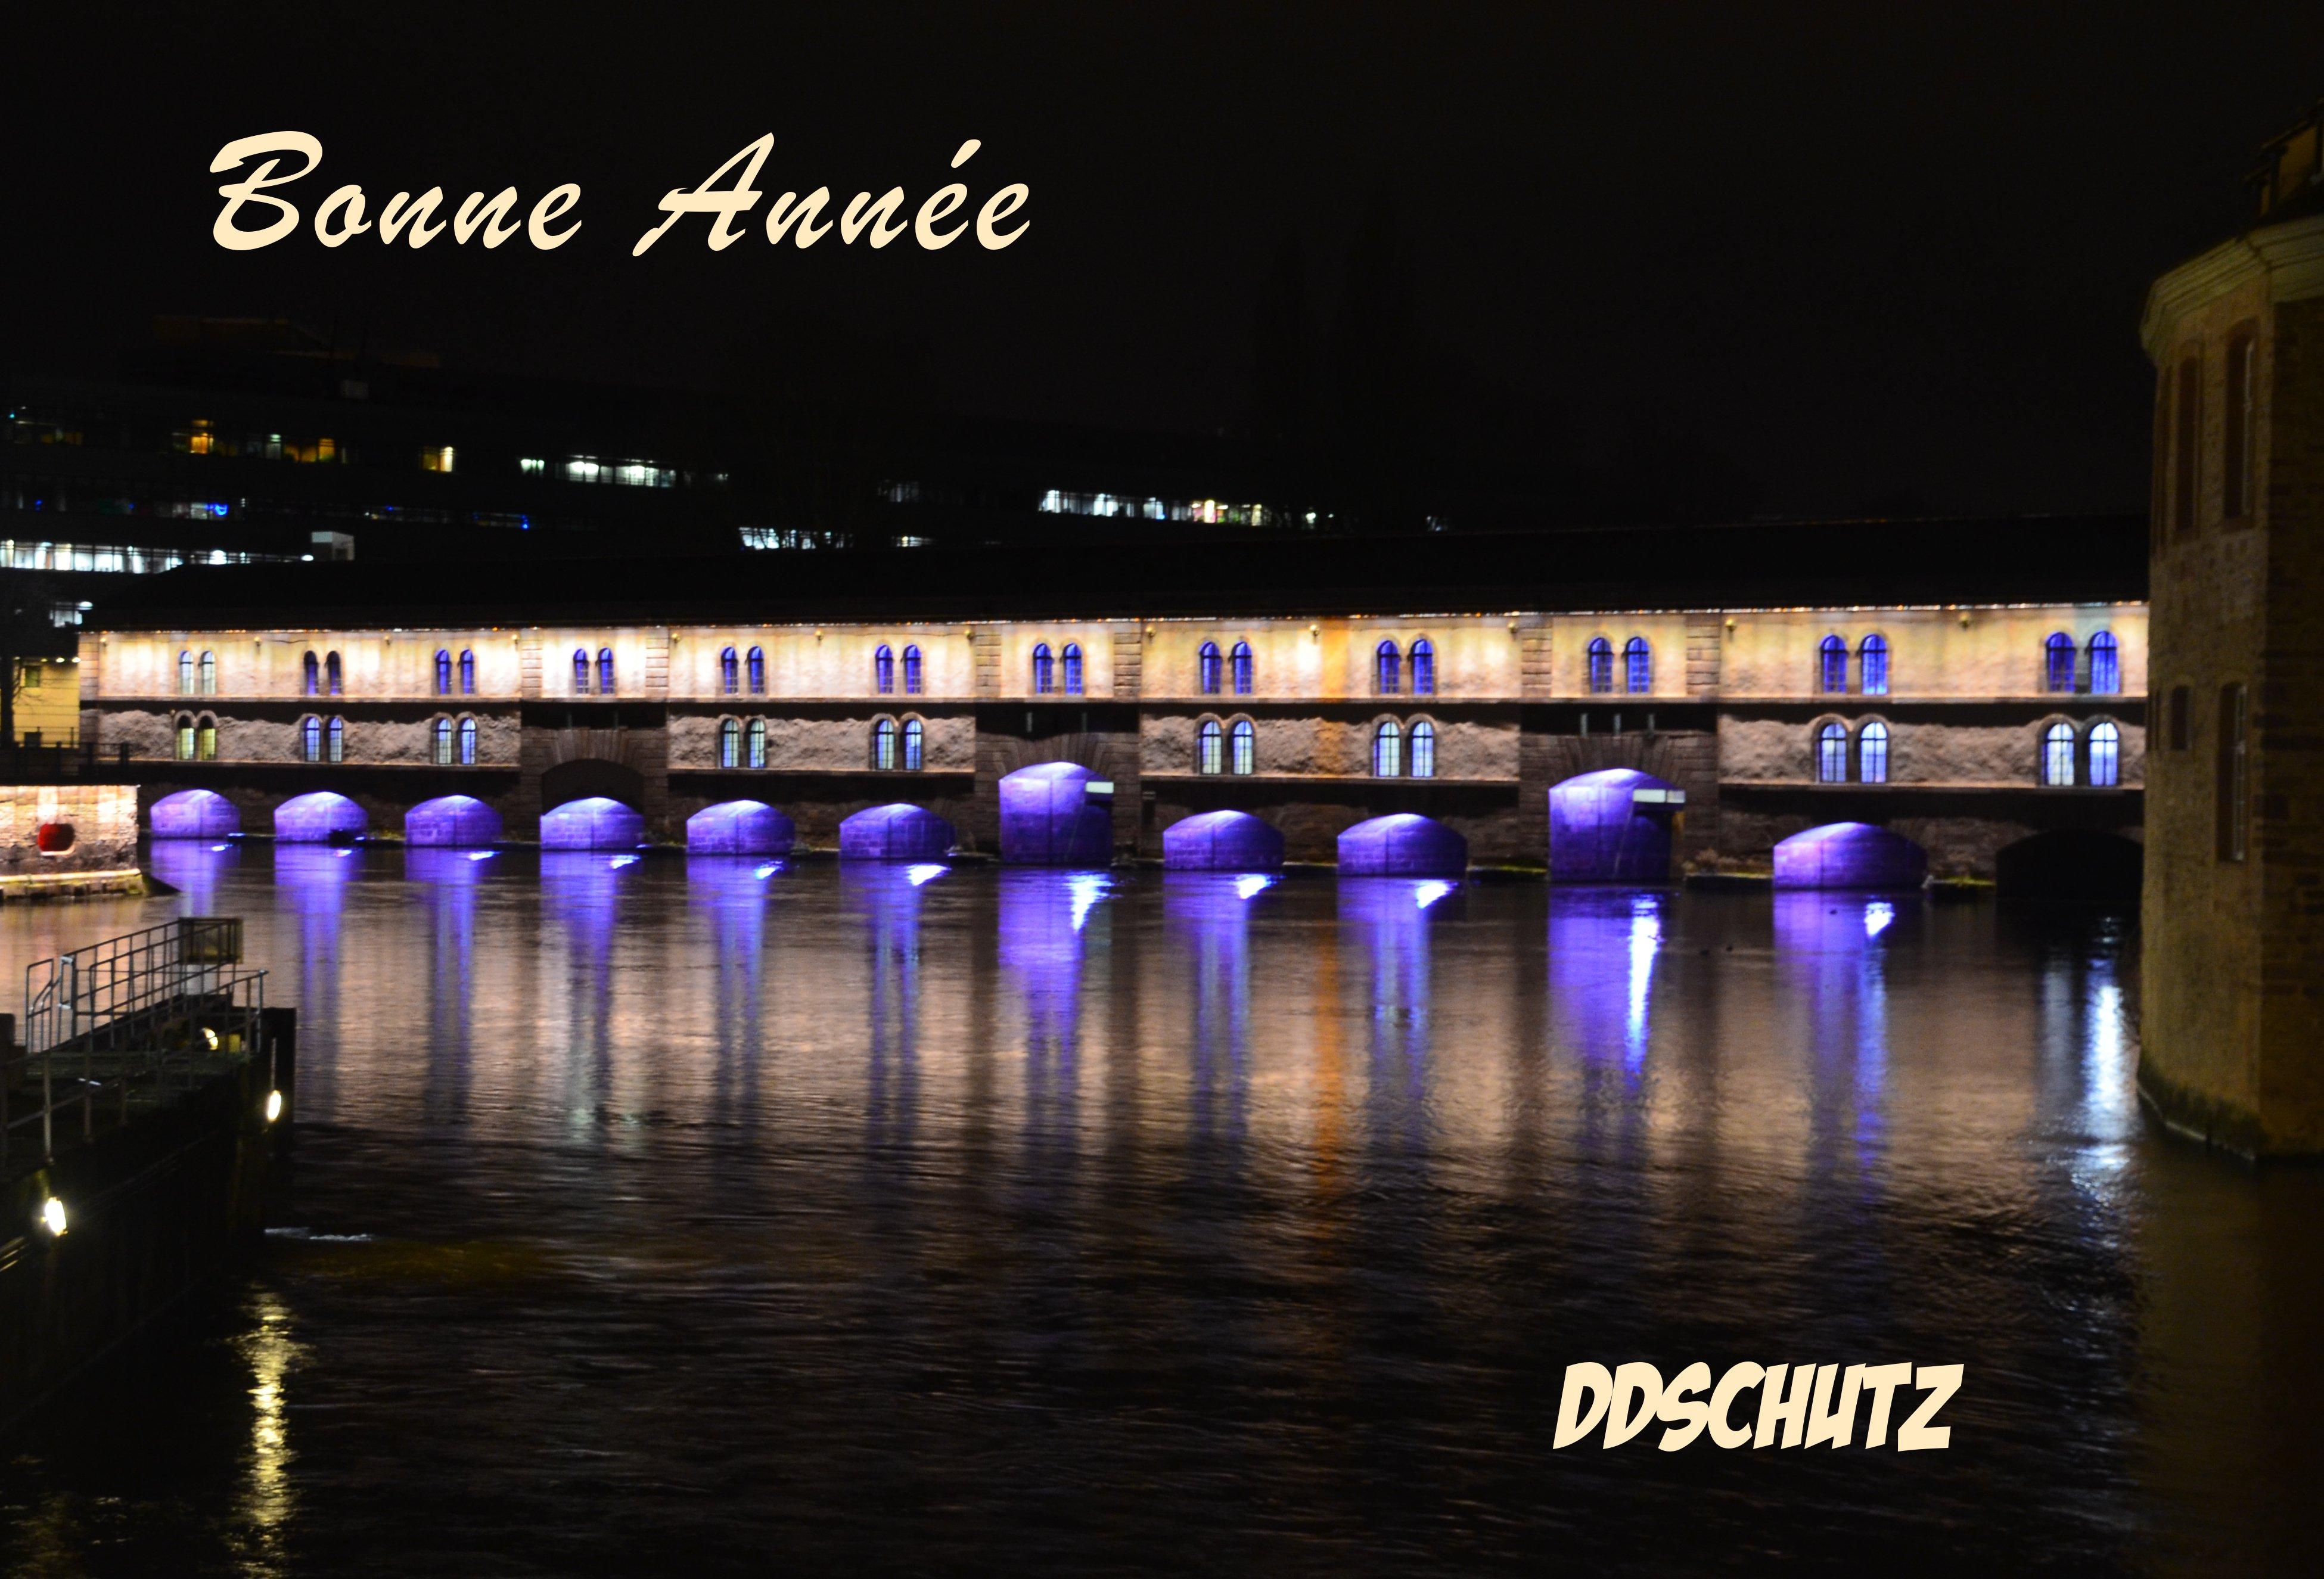 bonne-annee-2015-ddschutz